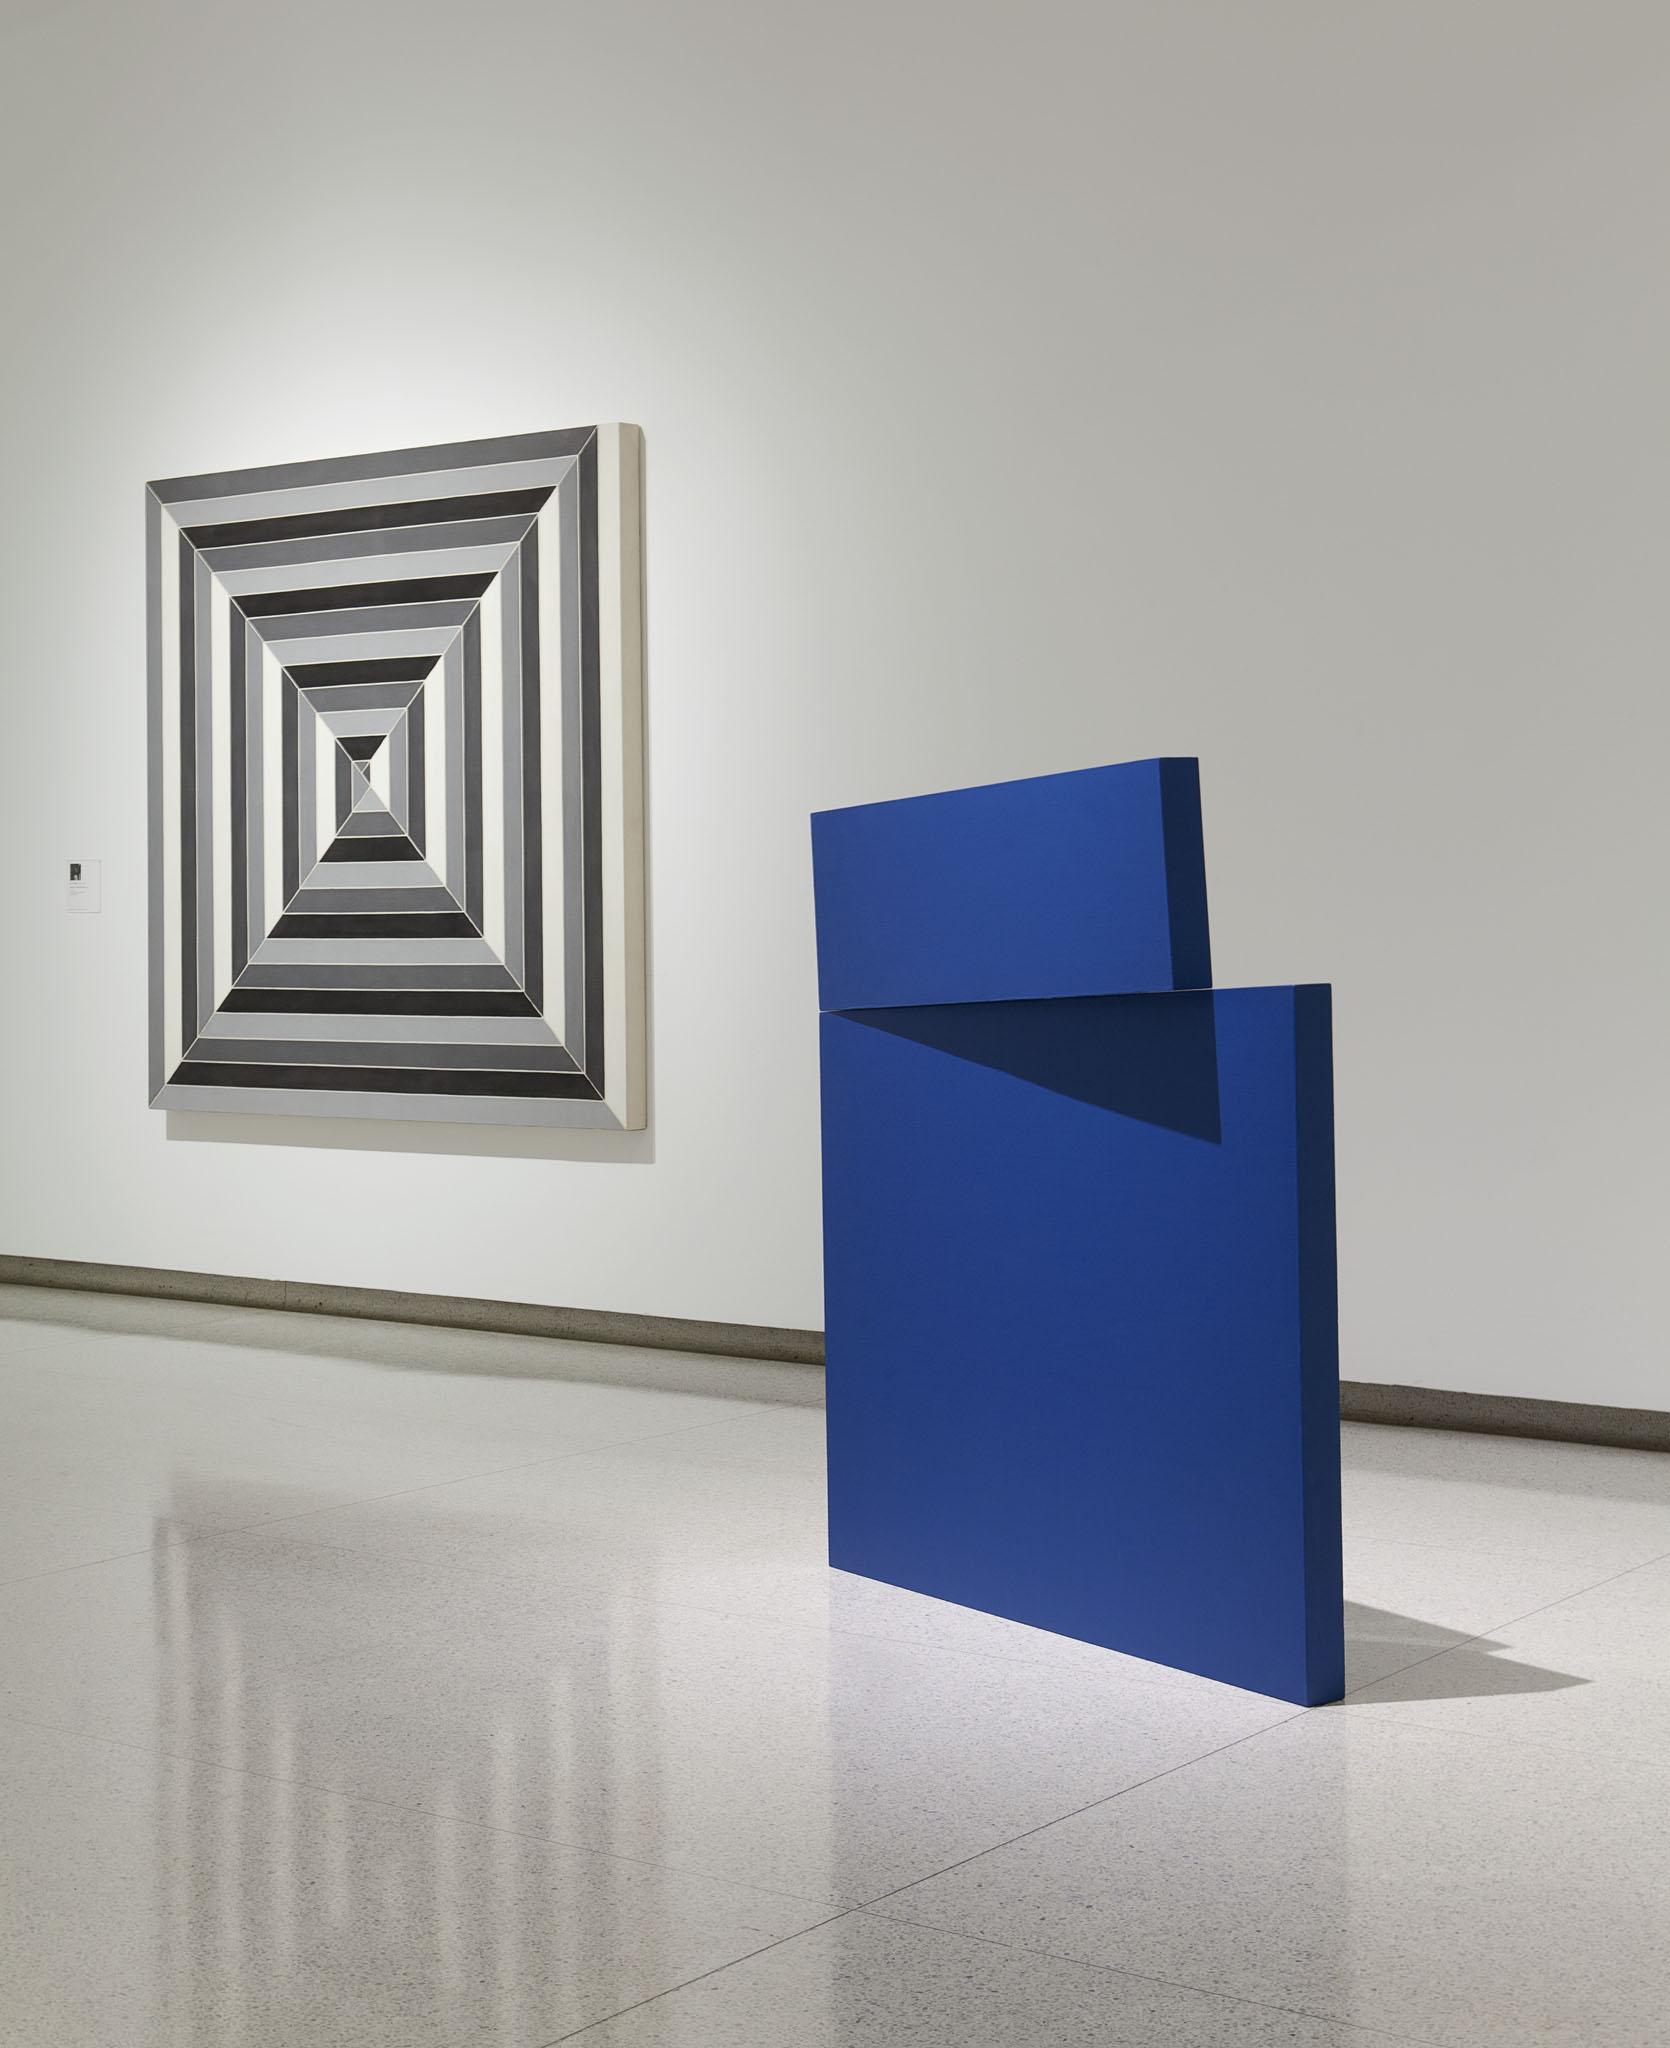 Carmen Herrera exhibit at the Walker Art Center